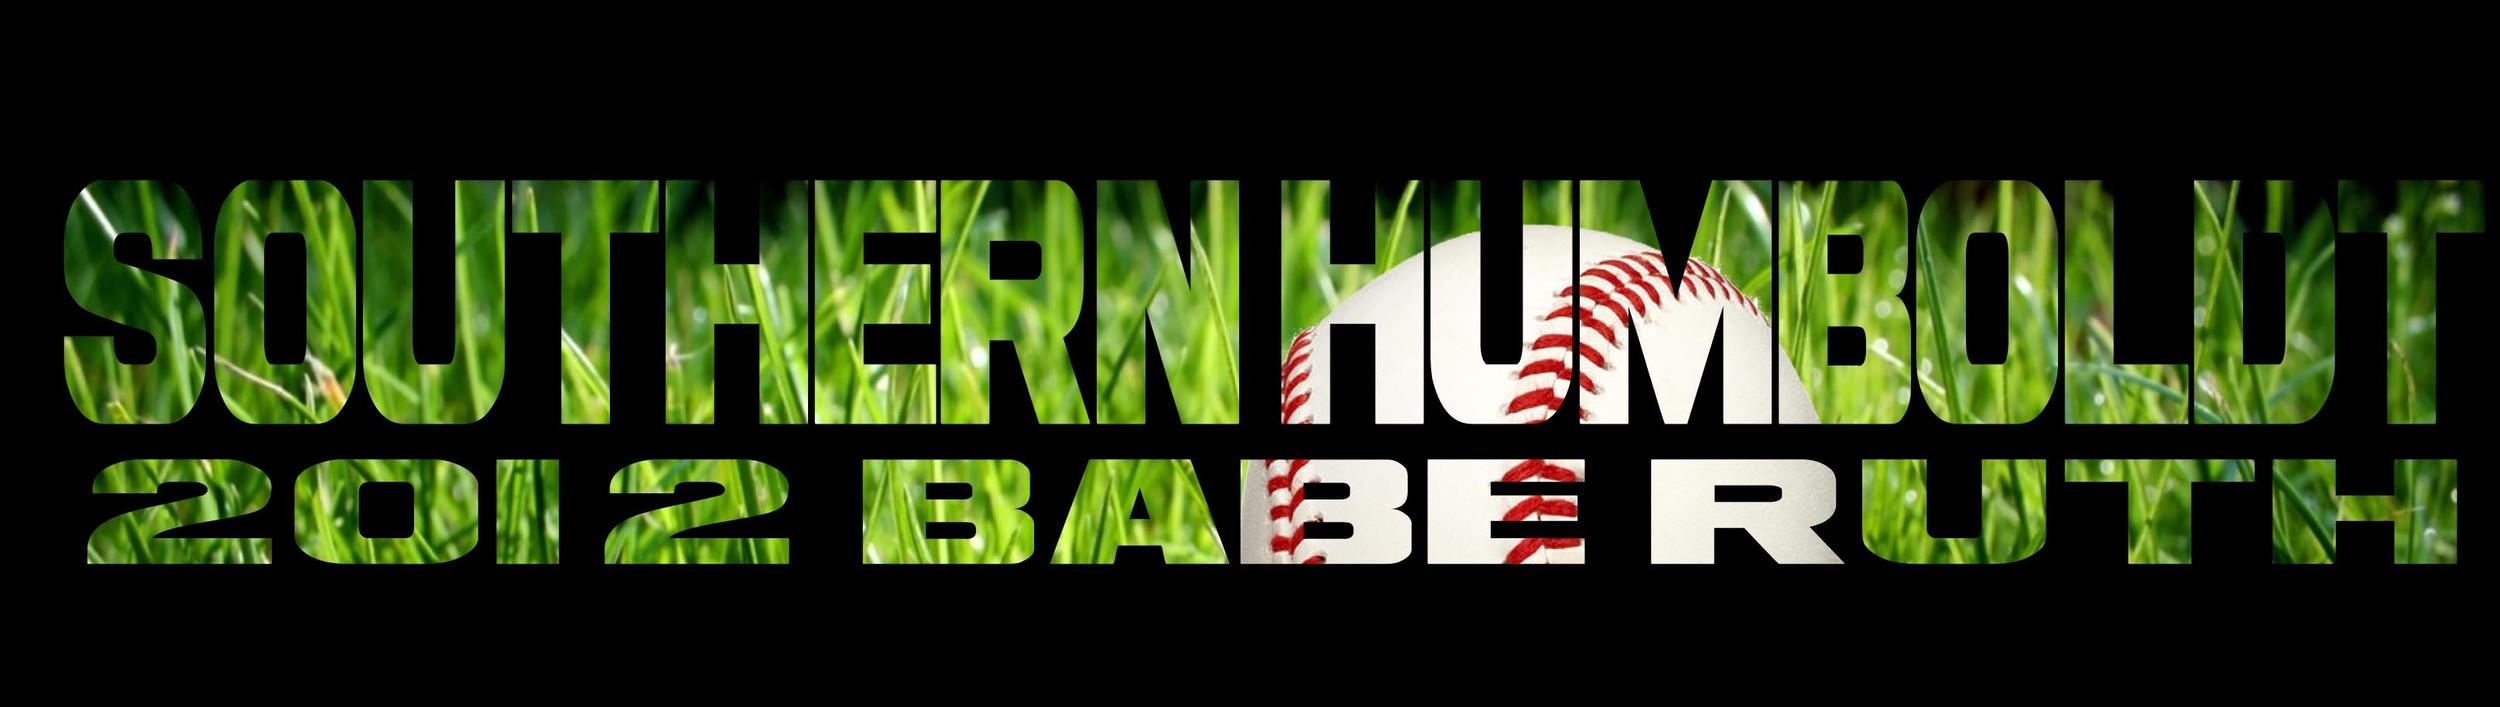 Babe Ruth copy.jpg